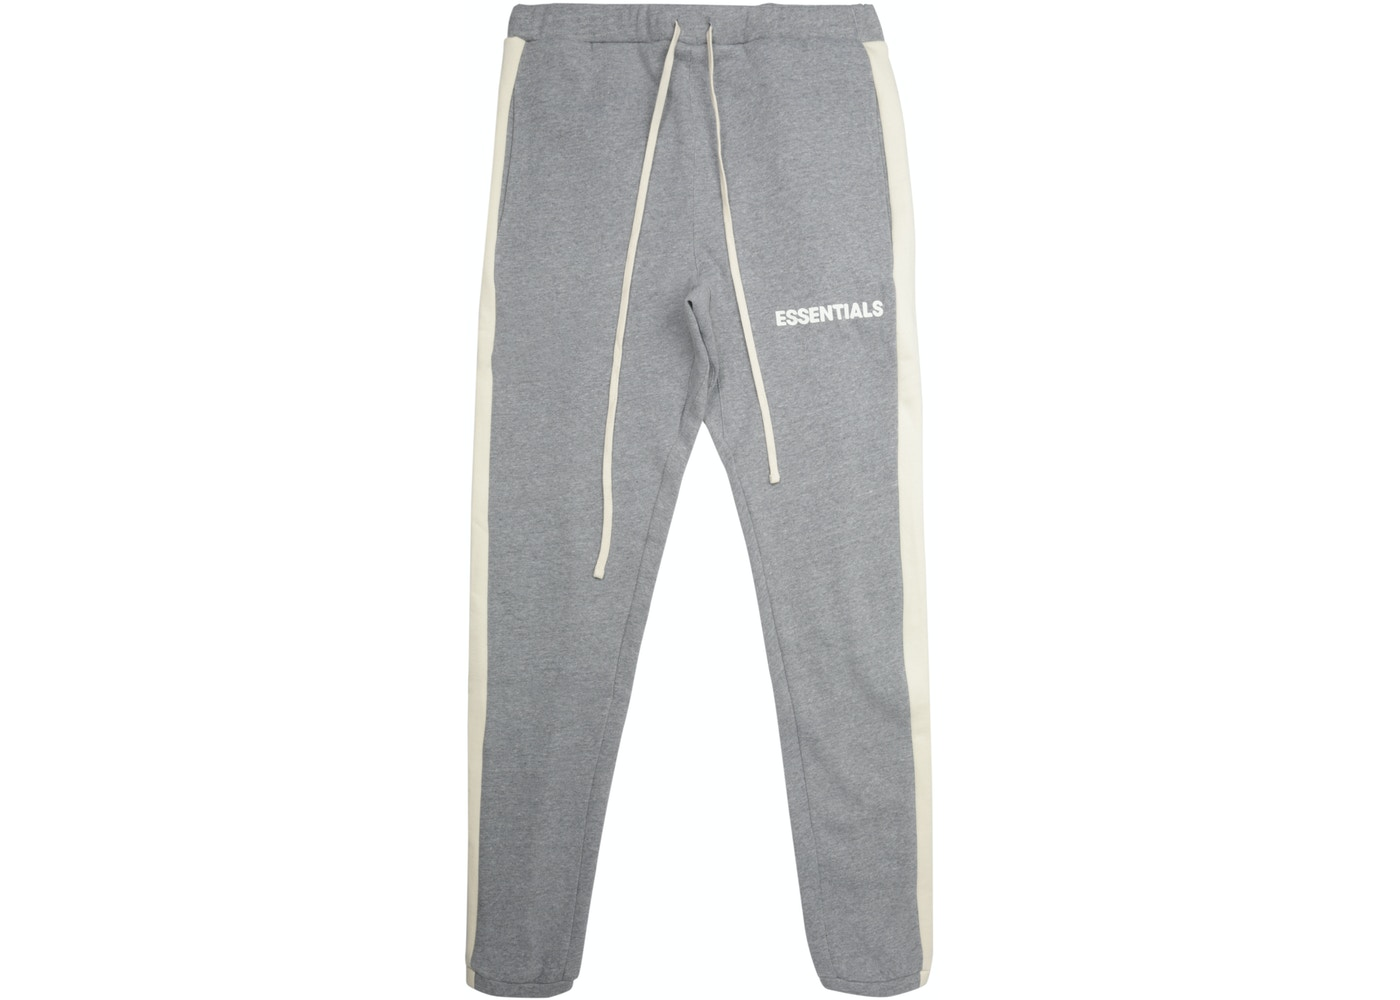 f4f346799e5 FEAR OF GOD Essentials Side Stripe Sweatpants Grey - FW18